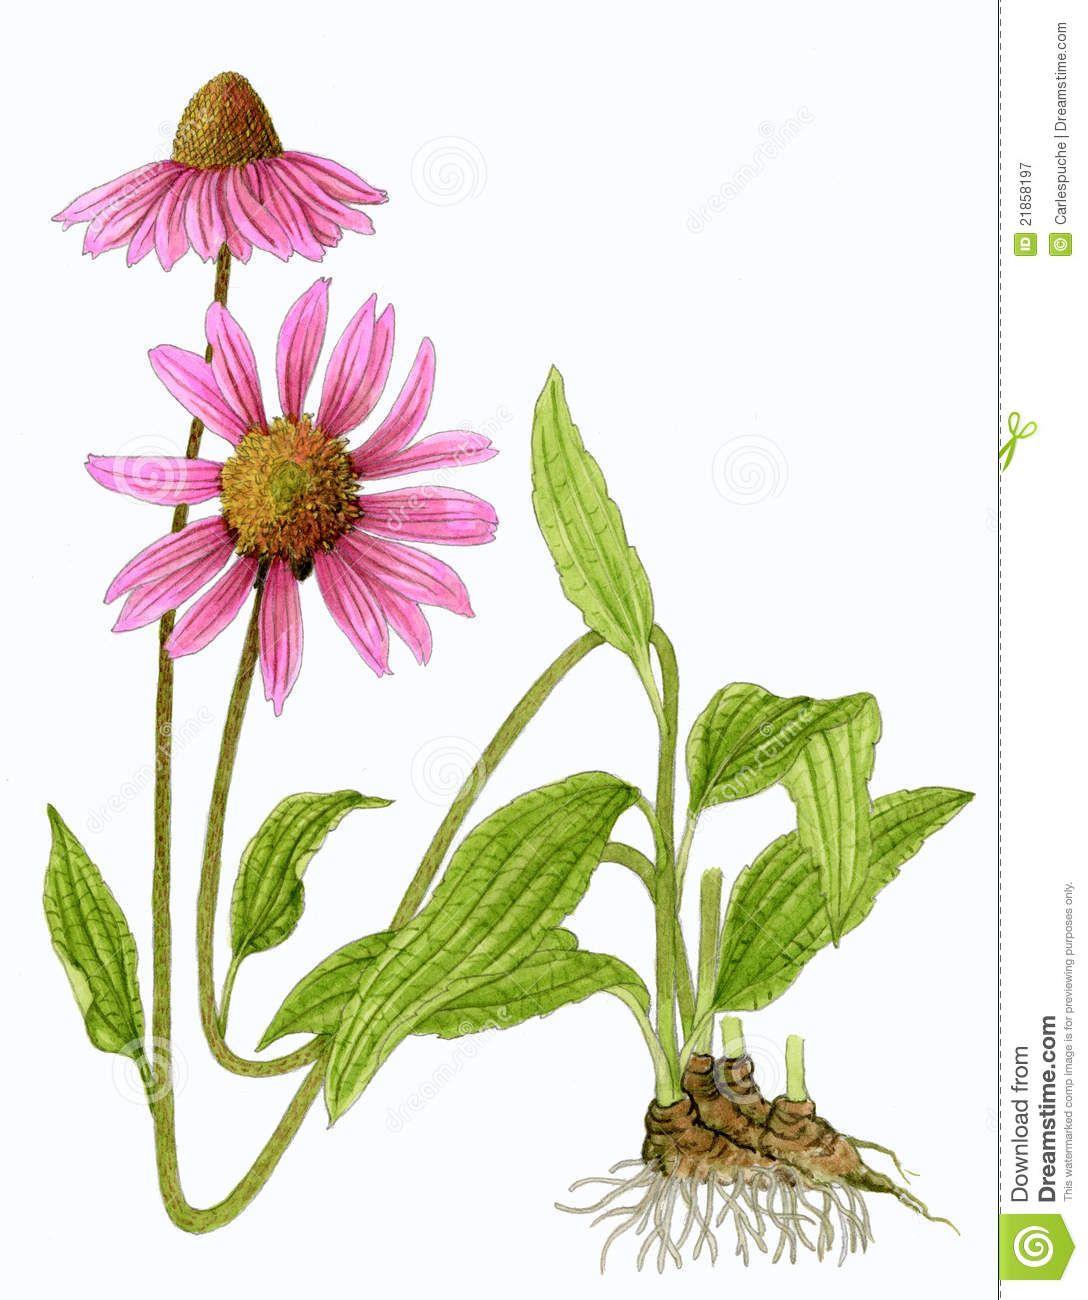 Eastern Purple Coneflower Echinacea Purpurea Echinacea Purpurea Echinacea Pink Plant